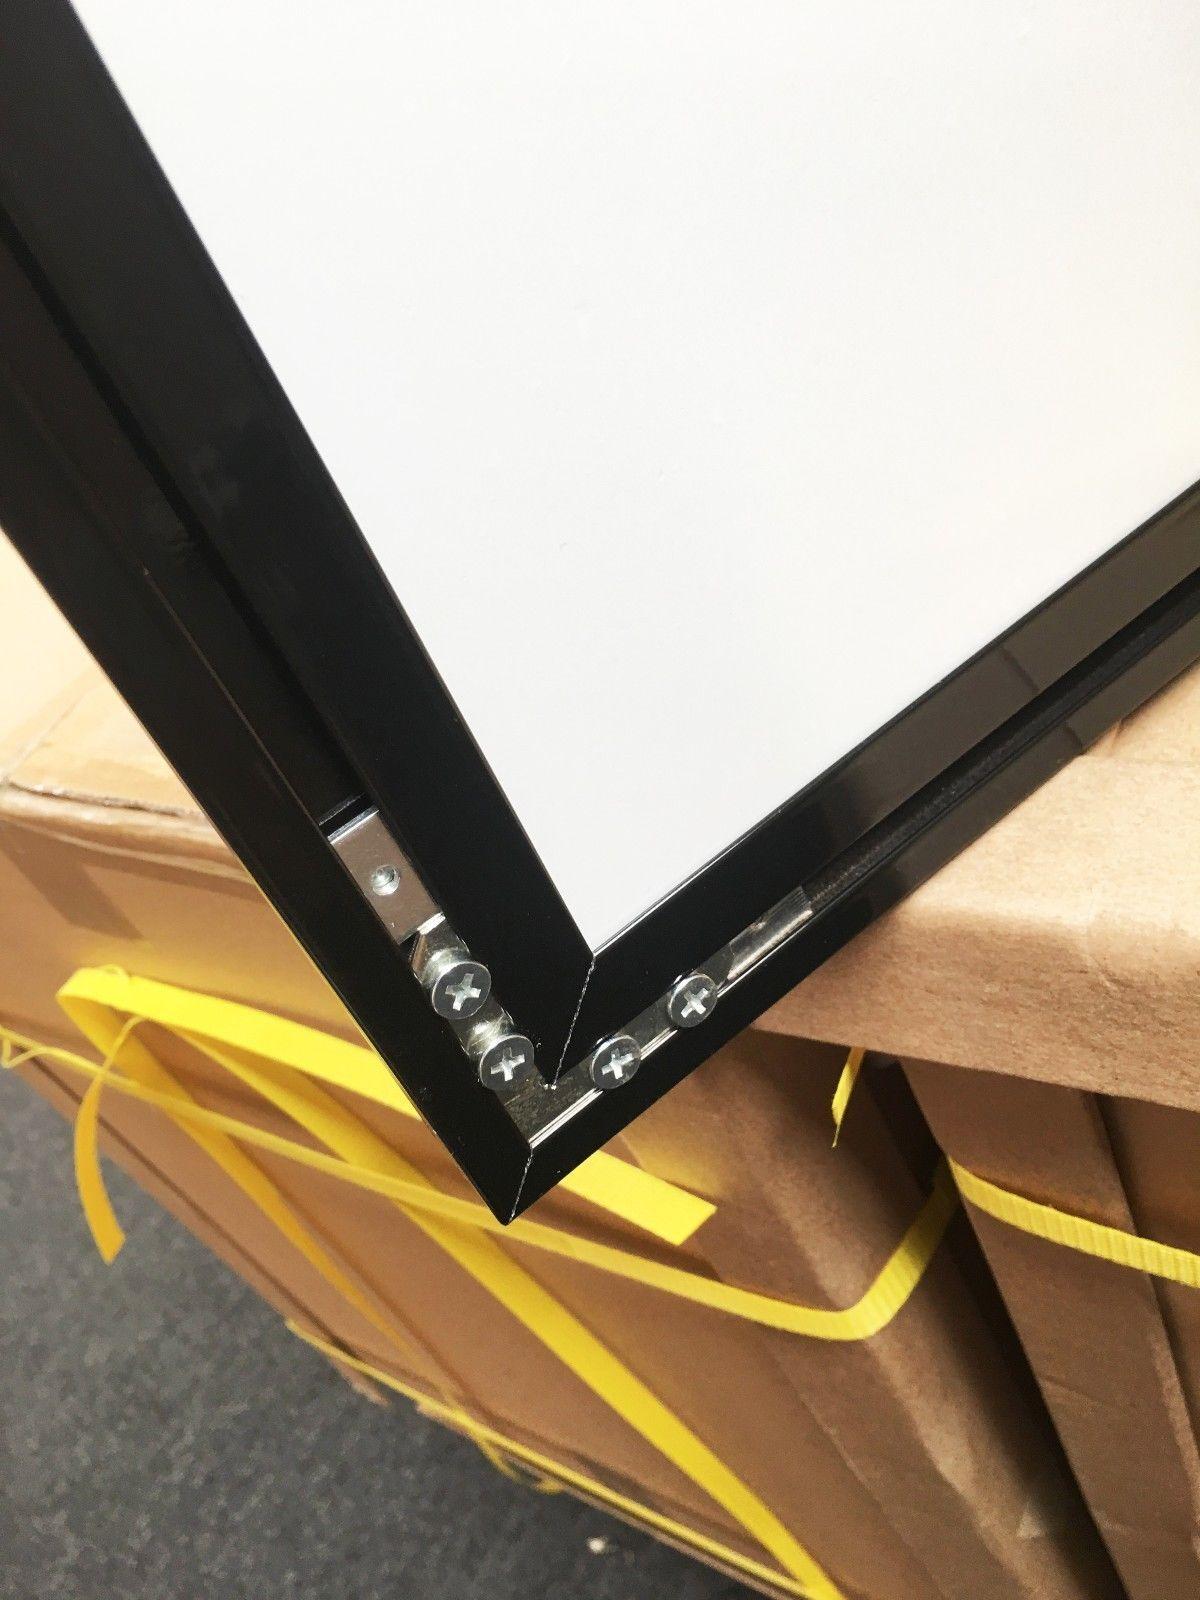 3XA2 3XA2 3XA2 Snap Marco Iluminado Cartel Vitrina kit de menú led caja al por mayor d4b97c